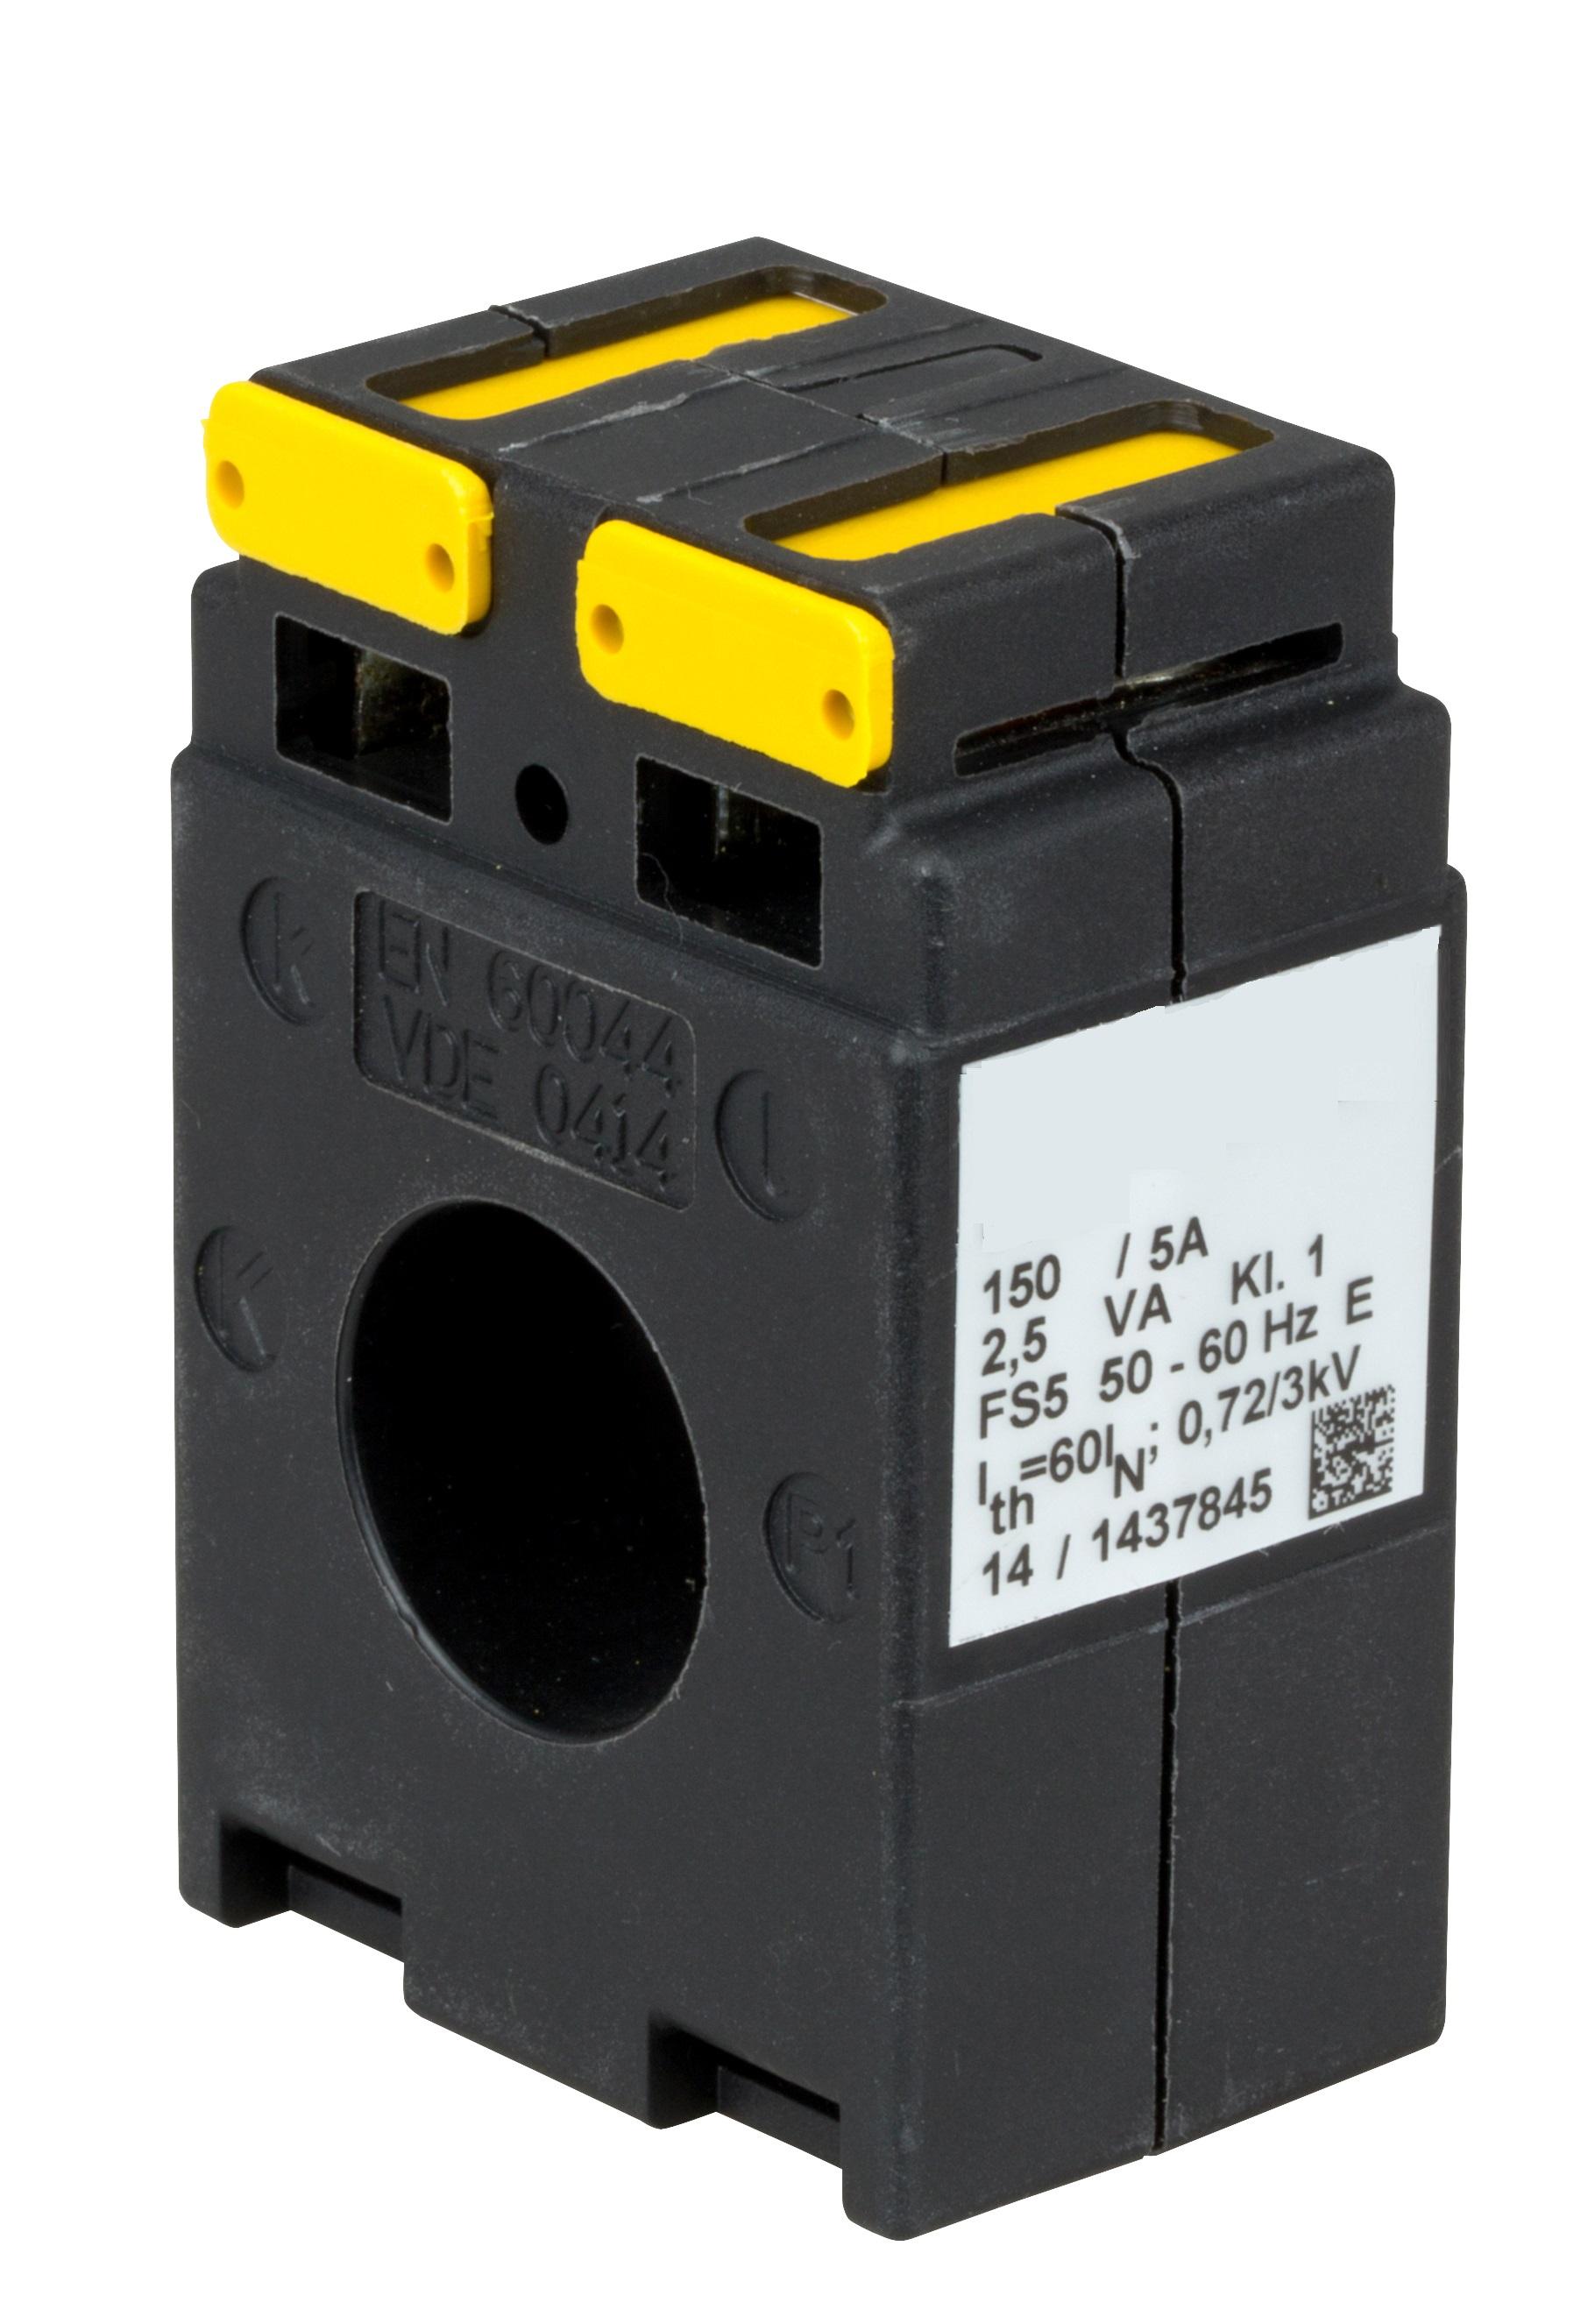 1 Stk Stromwandler 150/5A, 1,5VA, für NH Leiste Gr. 00 SI337420--